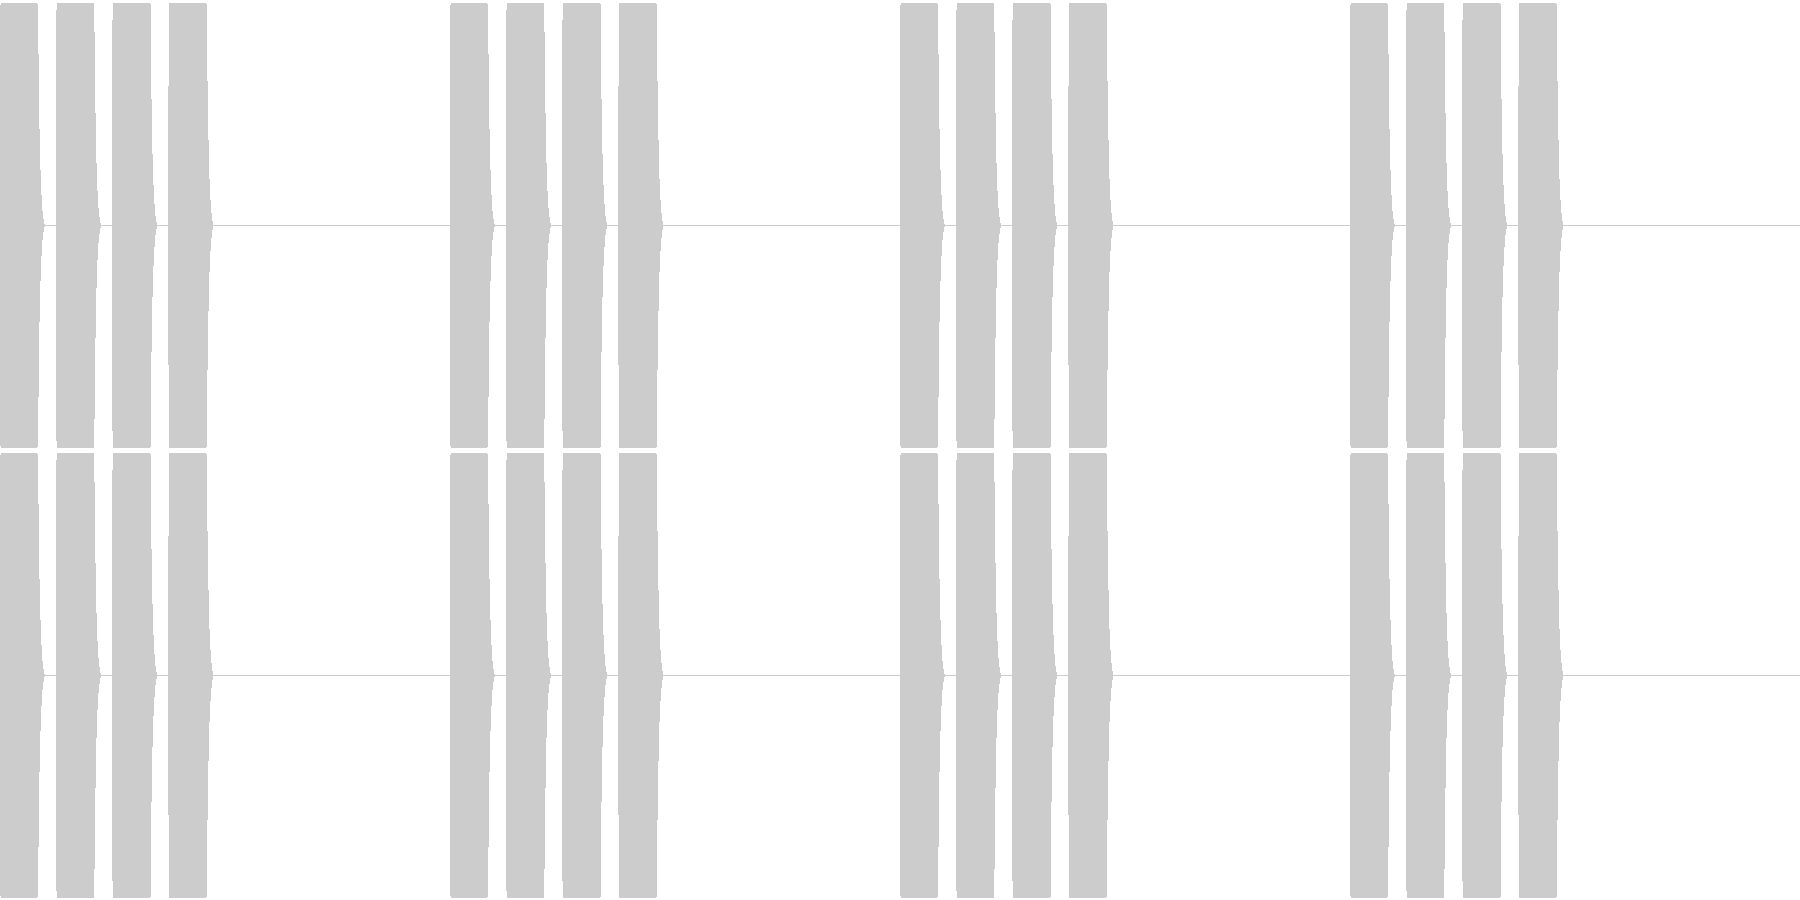 Thermo 体温計の音 ピピピピッ 2の未再生の波形